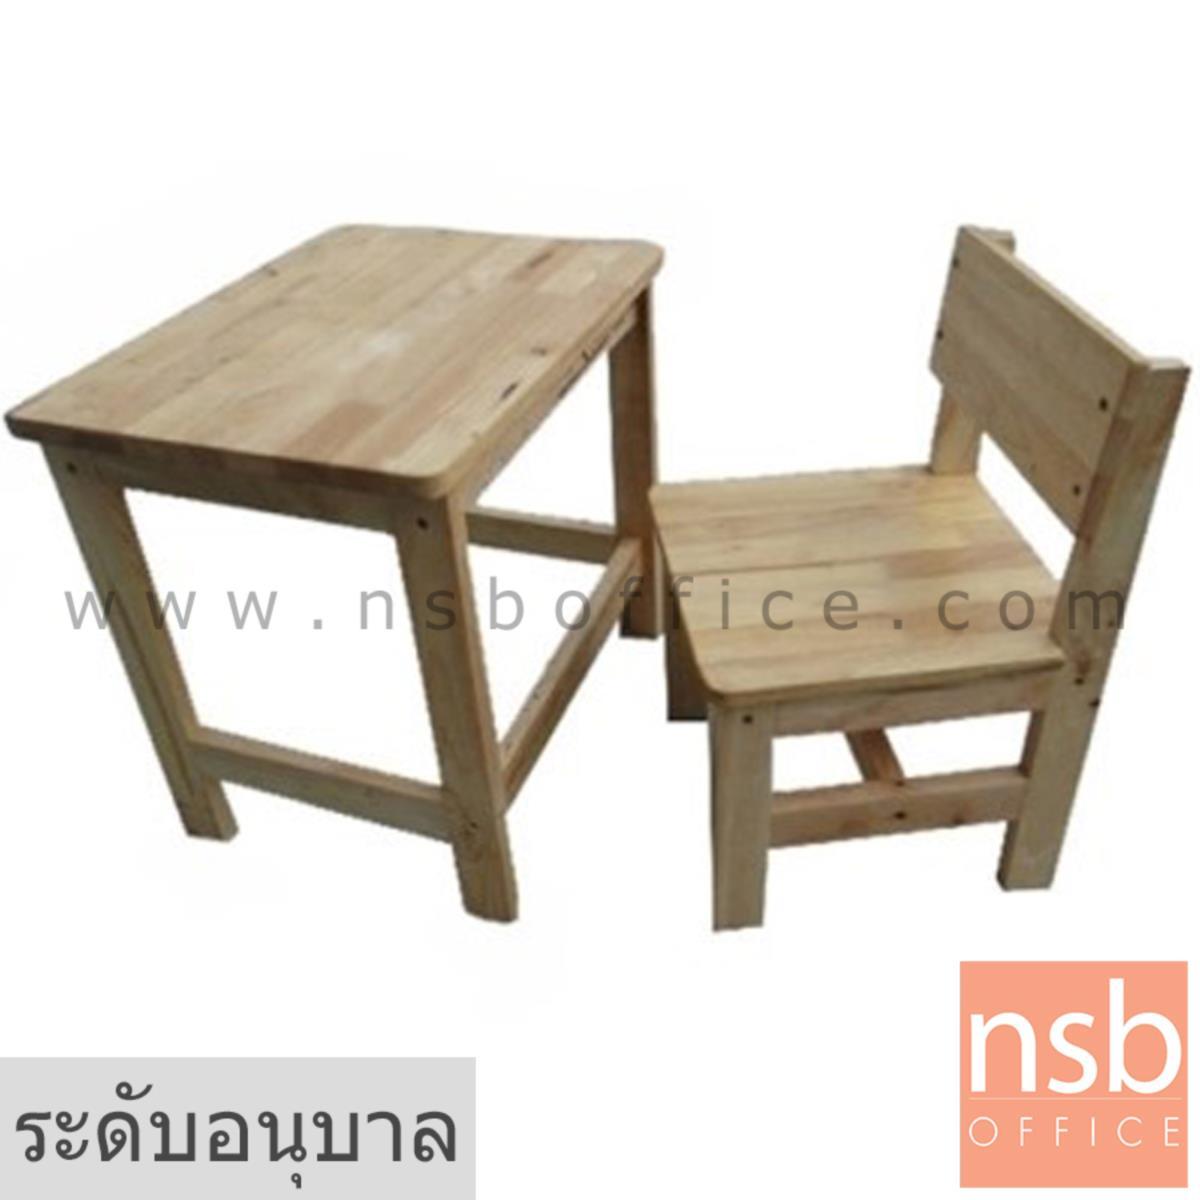 A17A062:ชุดโต๊ะและเก้าอี้นักเรียนไม้พาราล้วน รุ่น MAINE (เมน)  ระดับอนุบาล